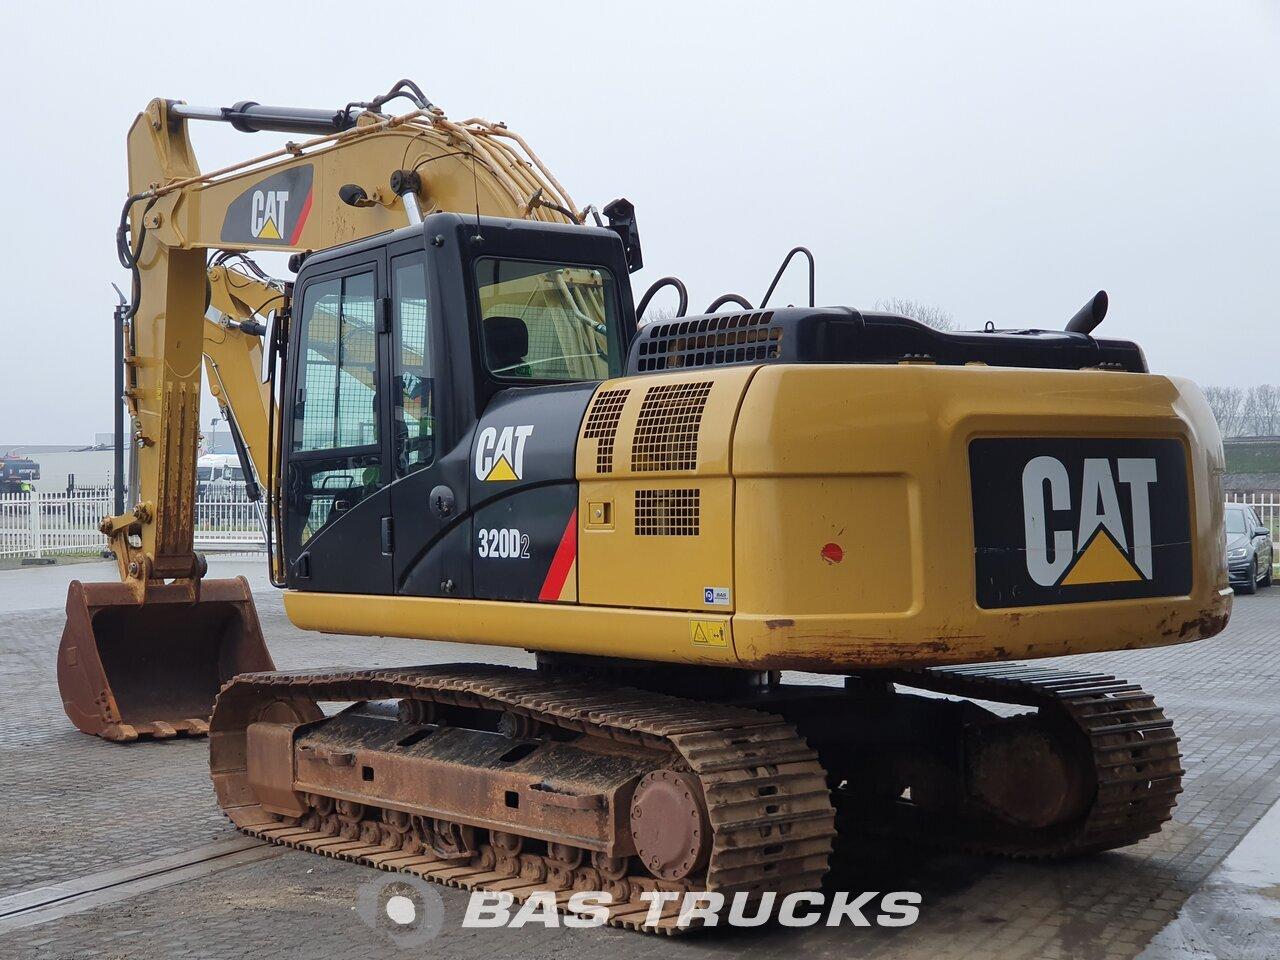 for sale at bas trucks caterpillar 2017 track excavator